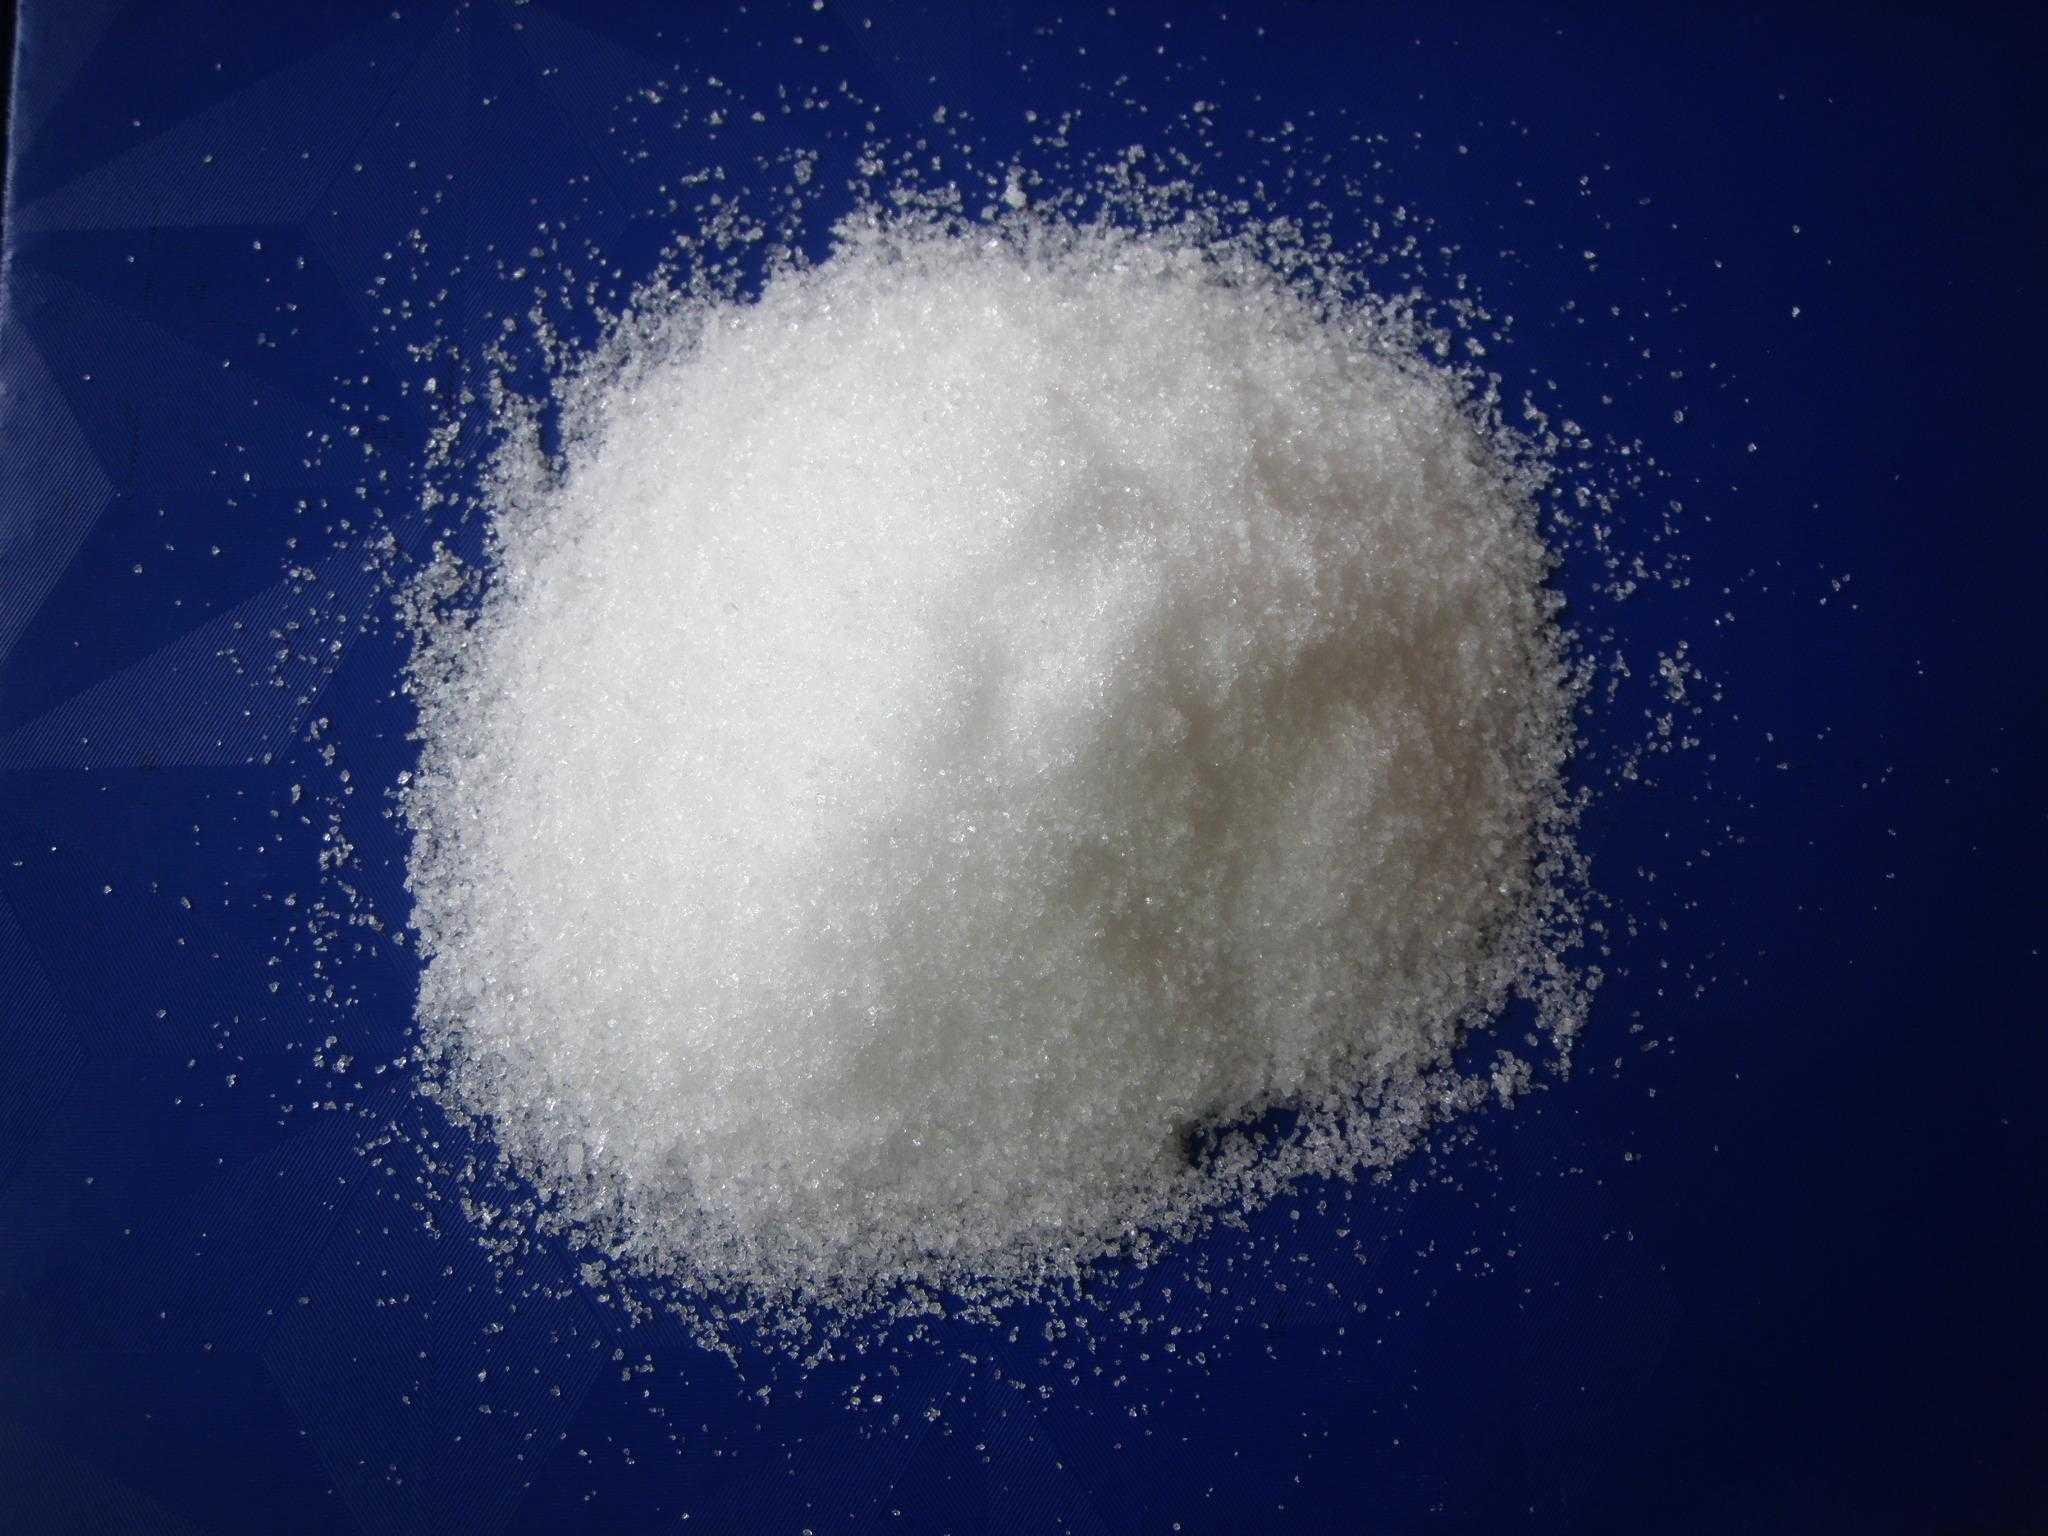 Monopotassium Phosphate, Fertilizer, Phosphate